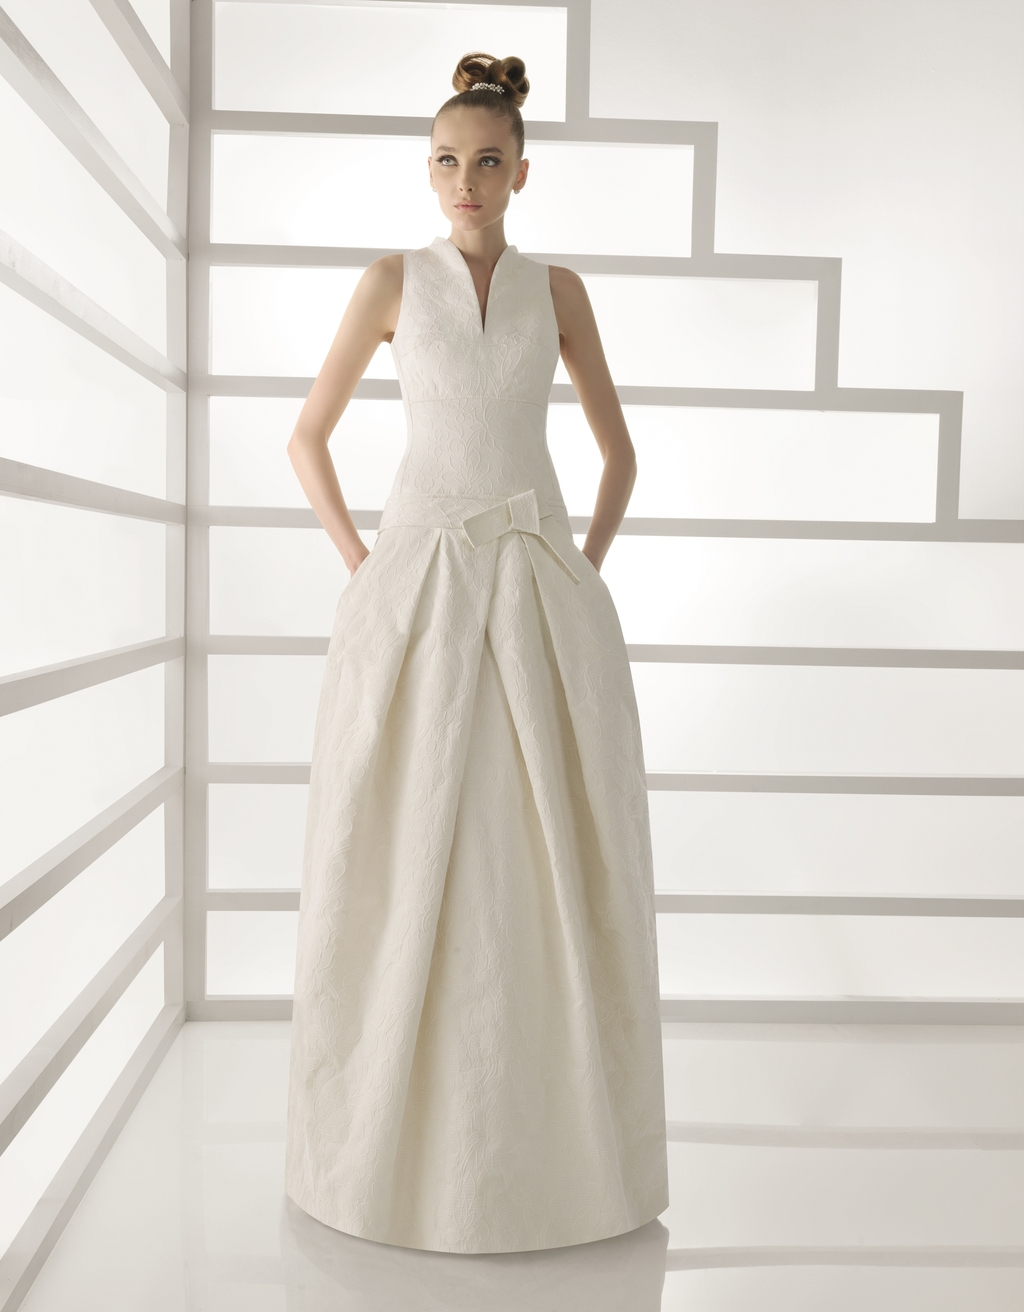 101-bano-ivory-jaquard-high-neck-wedding-dress-rosa-clara-2011.full